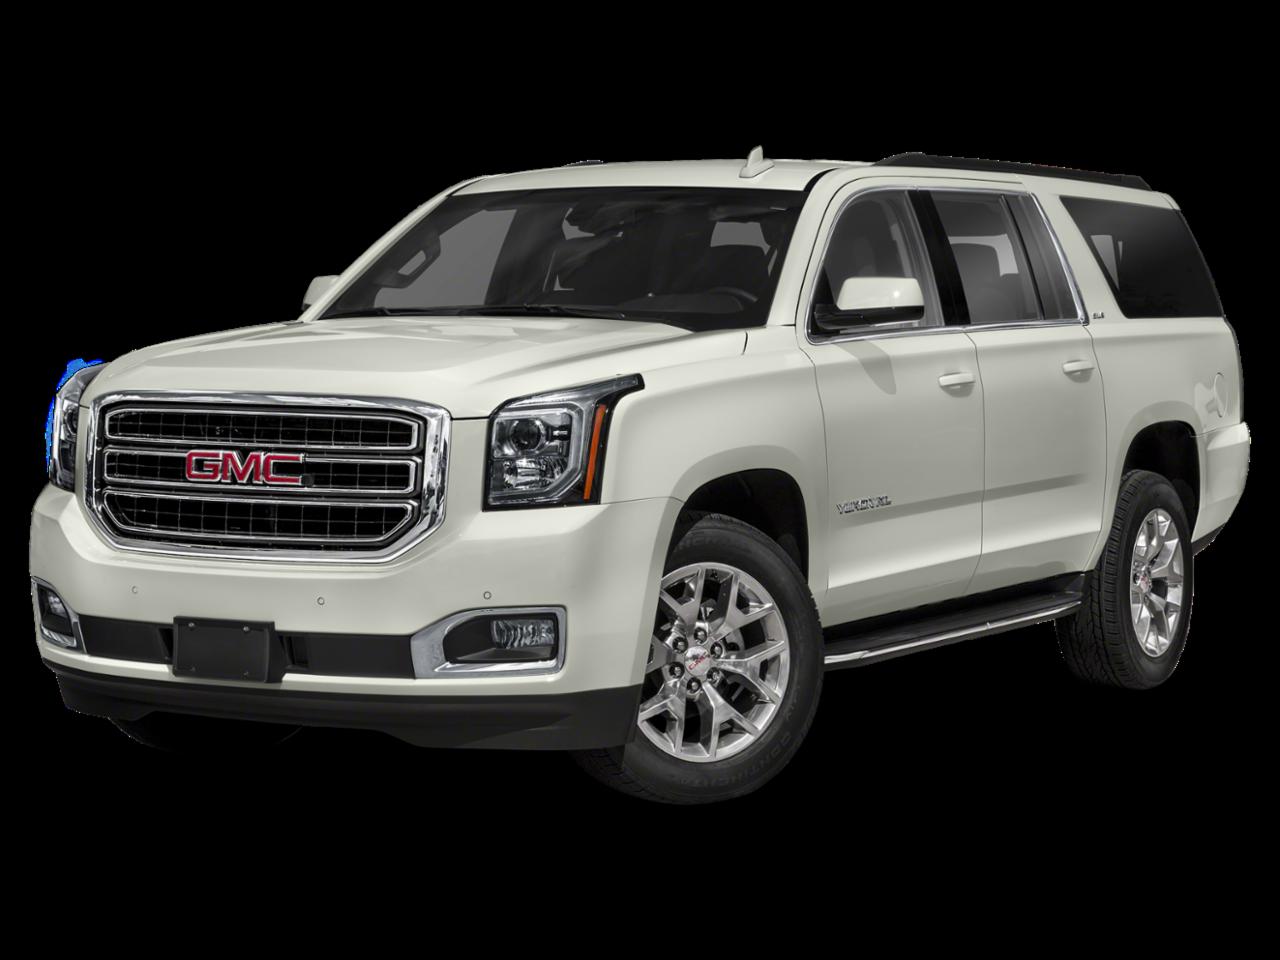 GMC 2019 Yukon XL SLT Standard Edition